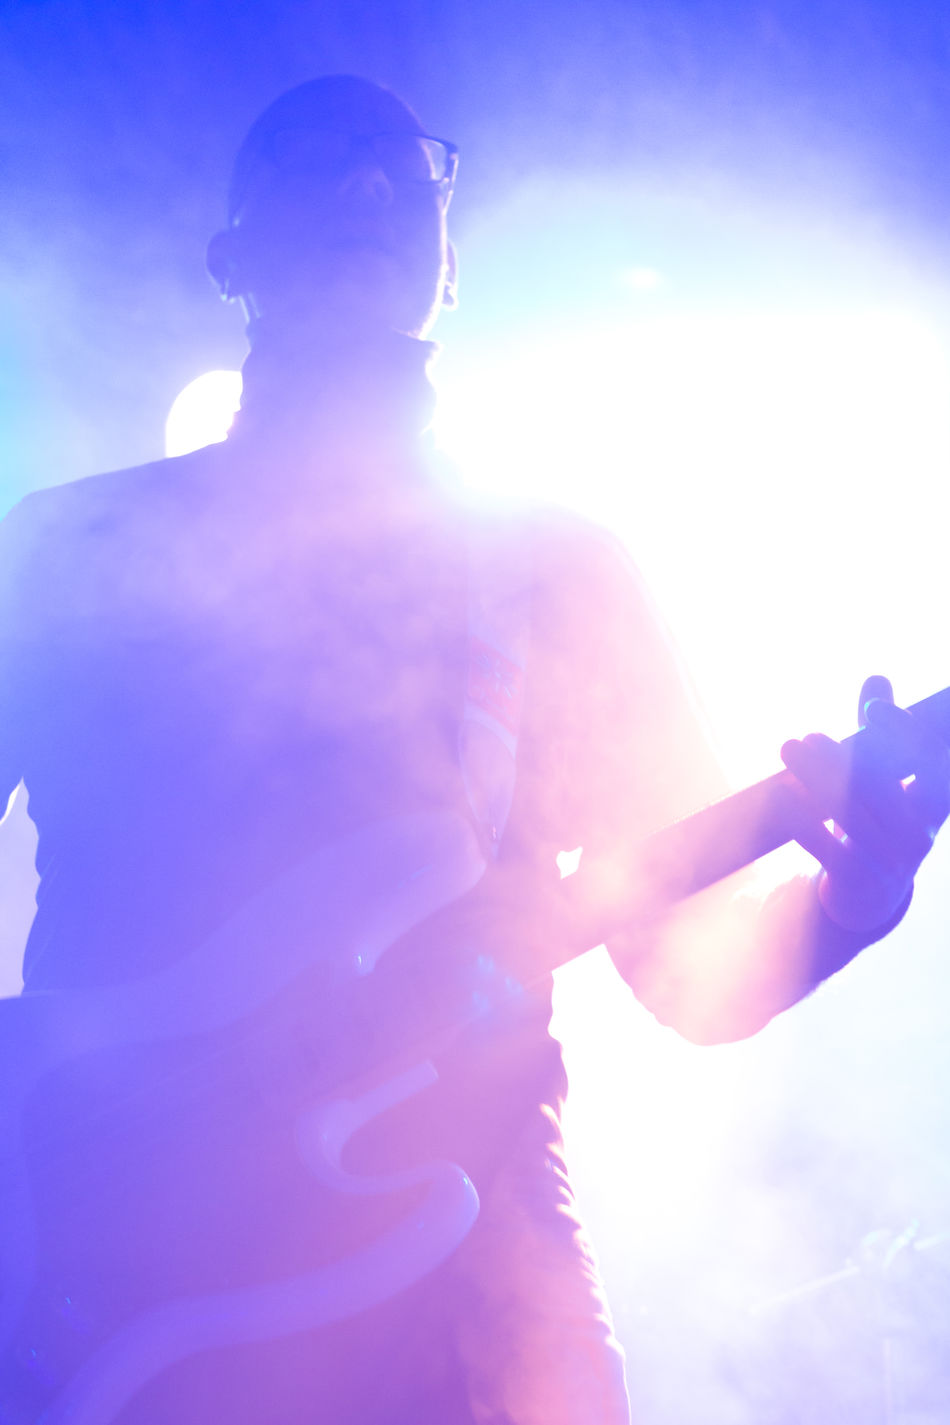 www.demianmusic.de Berlin Multi Colored One Man Only Light Effect Night Men Music Kreuzberg Musikundfrieden Demian Demianmusic.de Indie Indie Rock Alternative Rock Concert Concert Photography LiveMusic Liveon Stage Band PROGRESSIVE Light Spotlight Lensflares